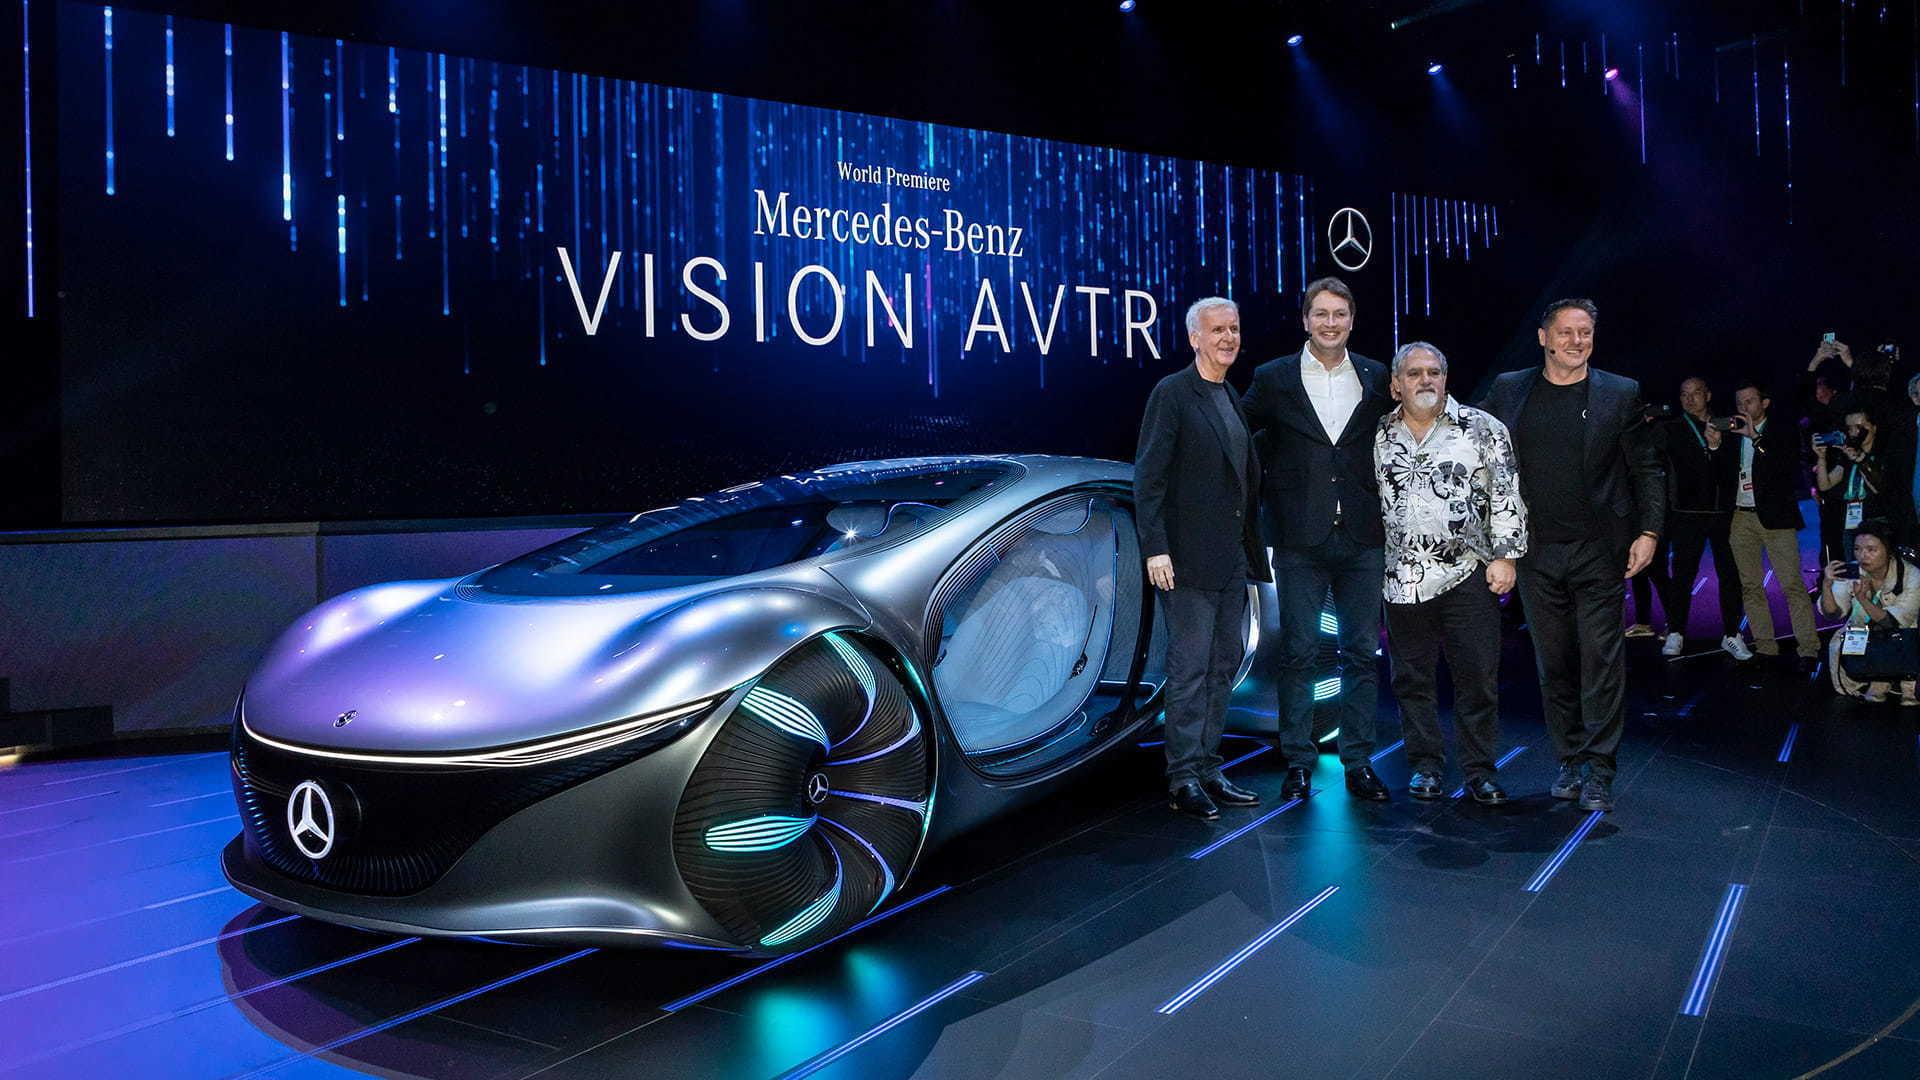 James Cameron, Ola Källenius, Jon Landau and Gorden Wagener pose with the VISION AVTR at CES 2020.